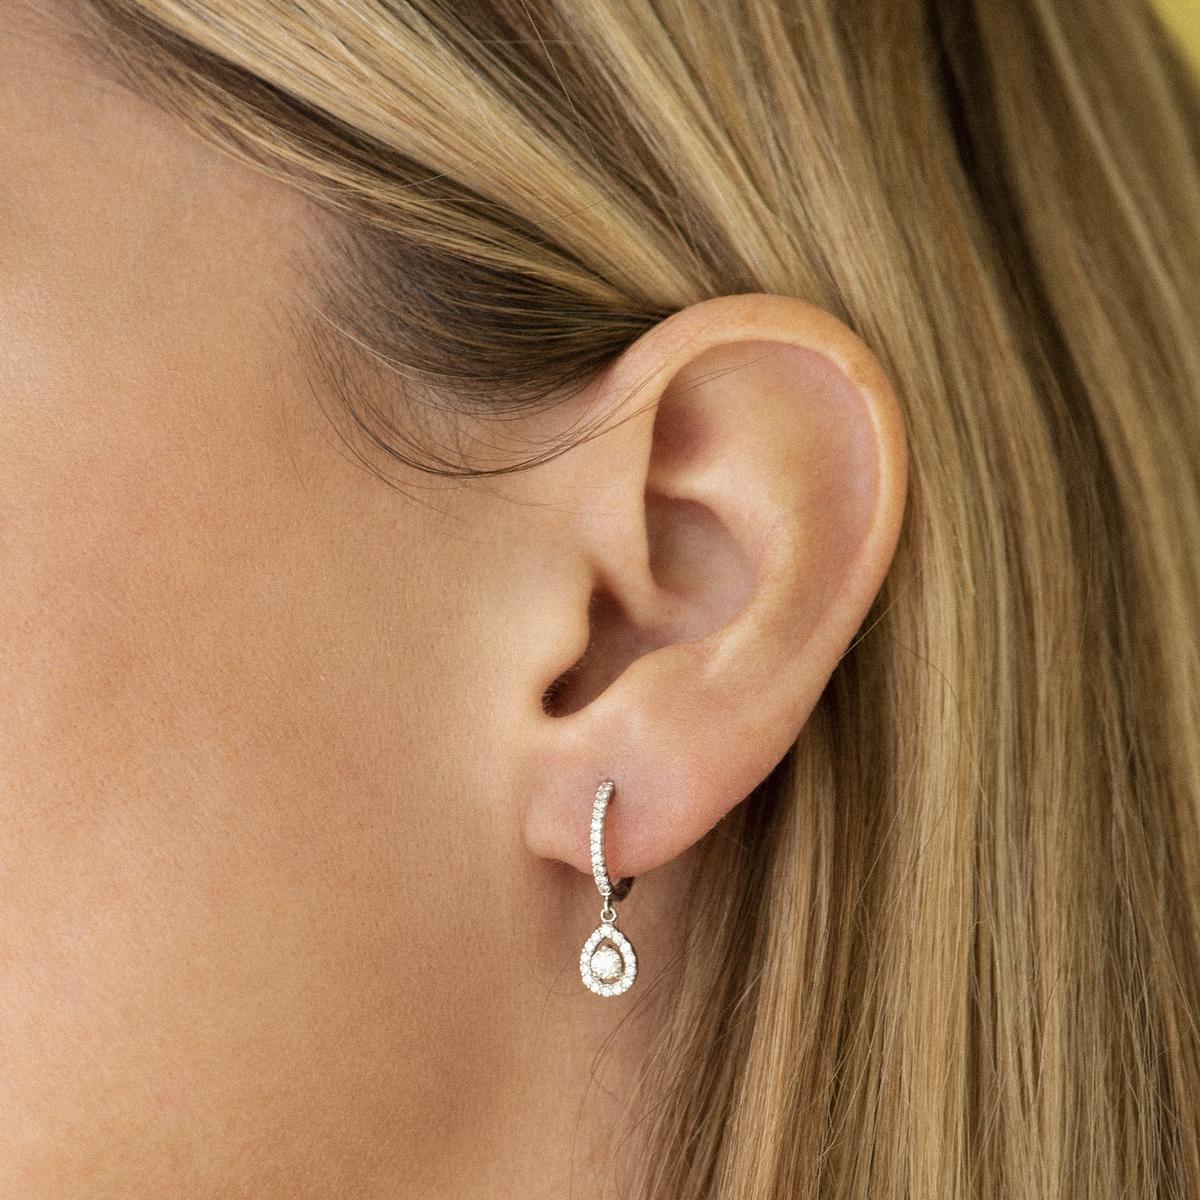 salina earrings in white gold